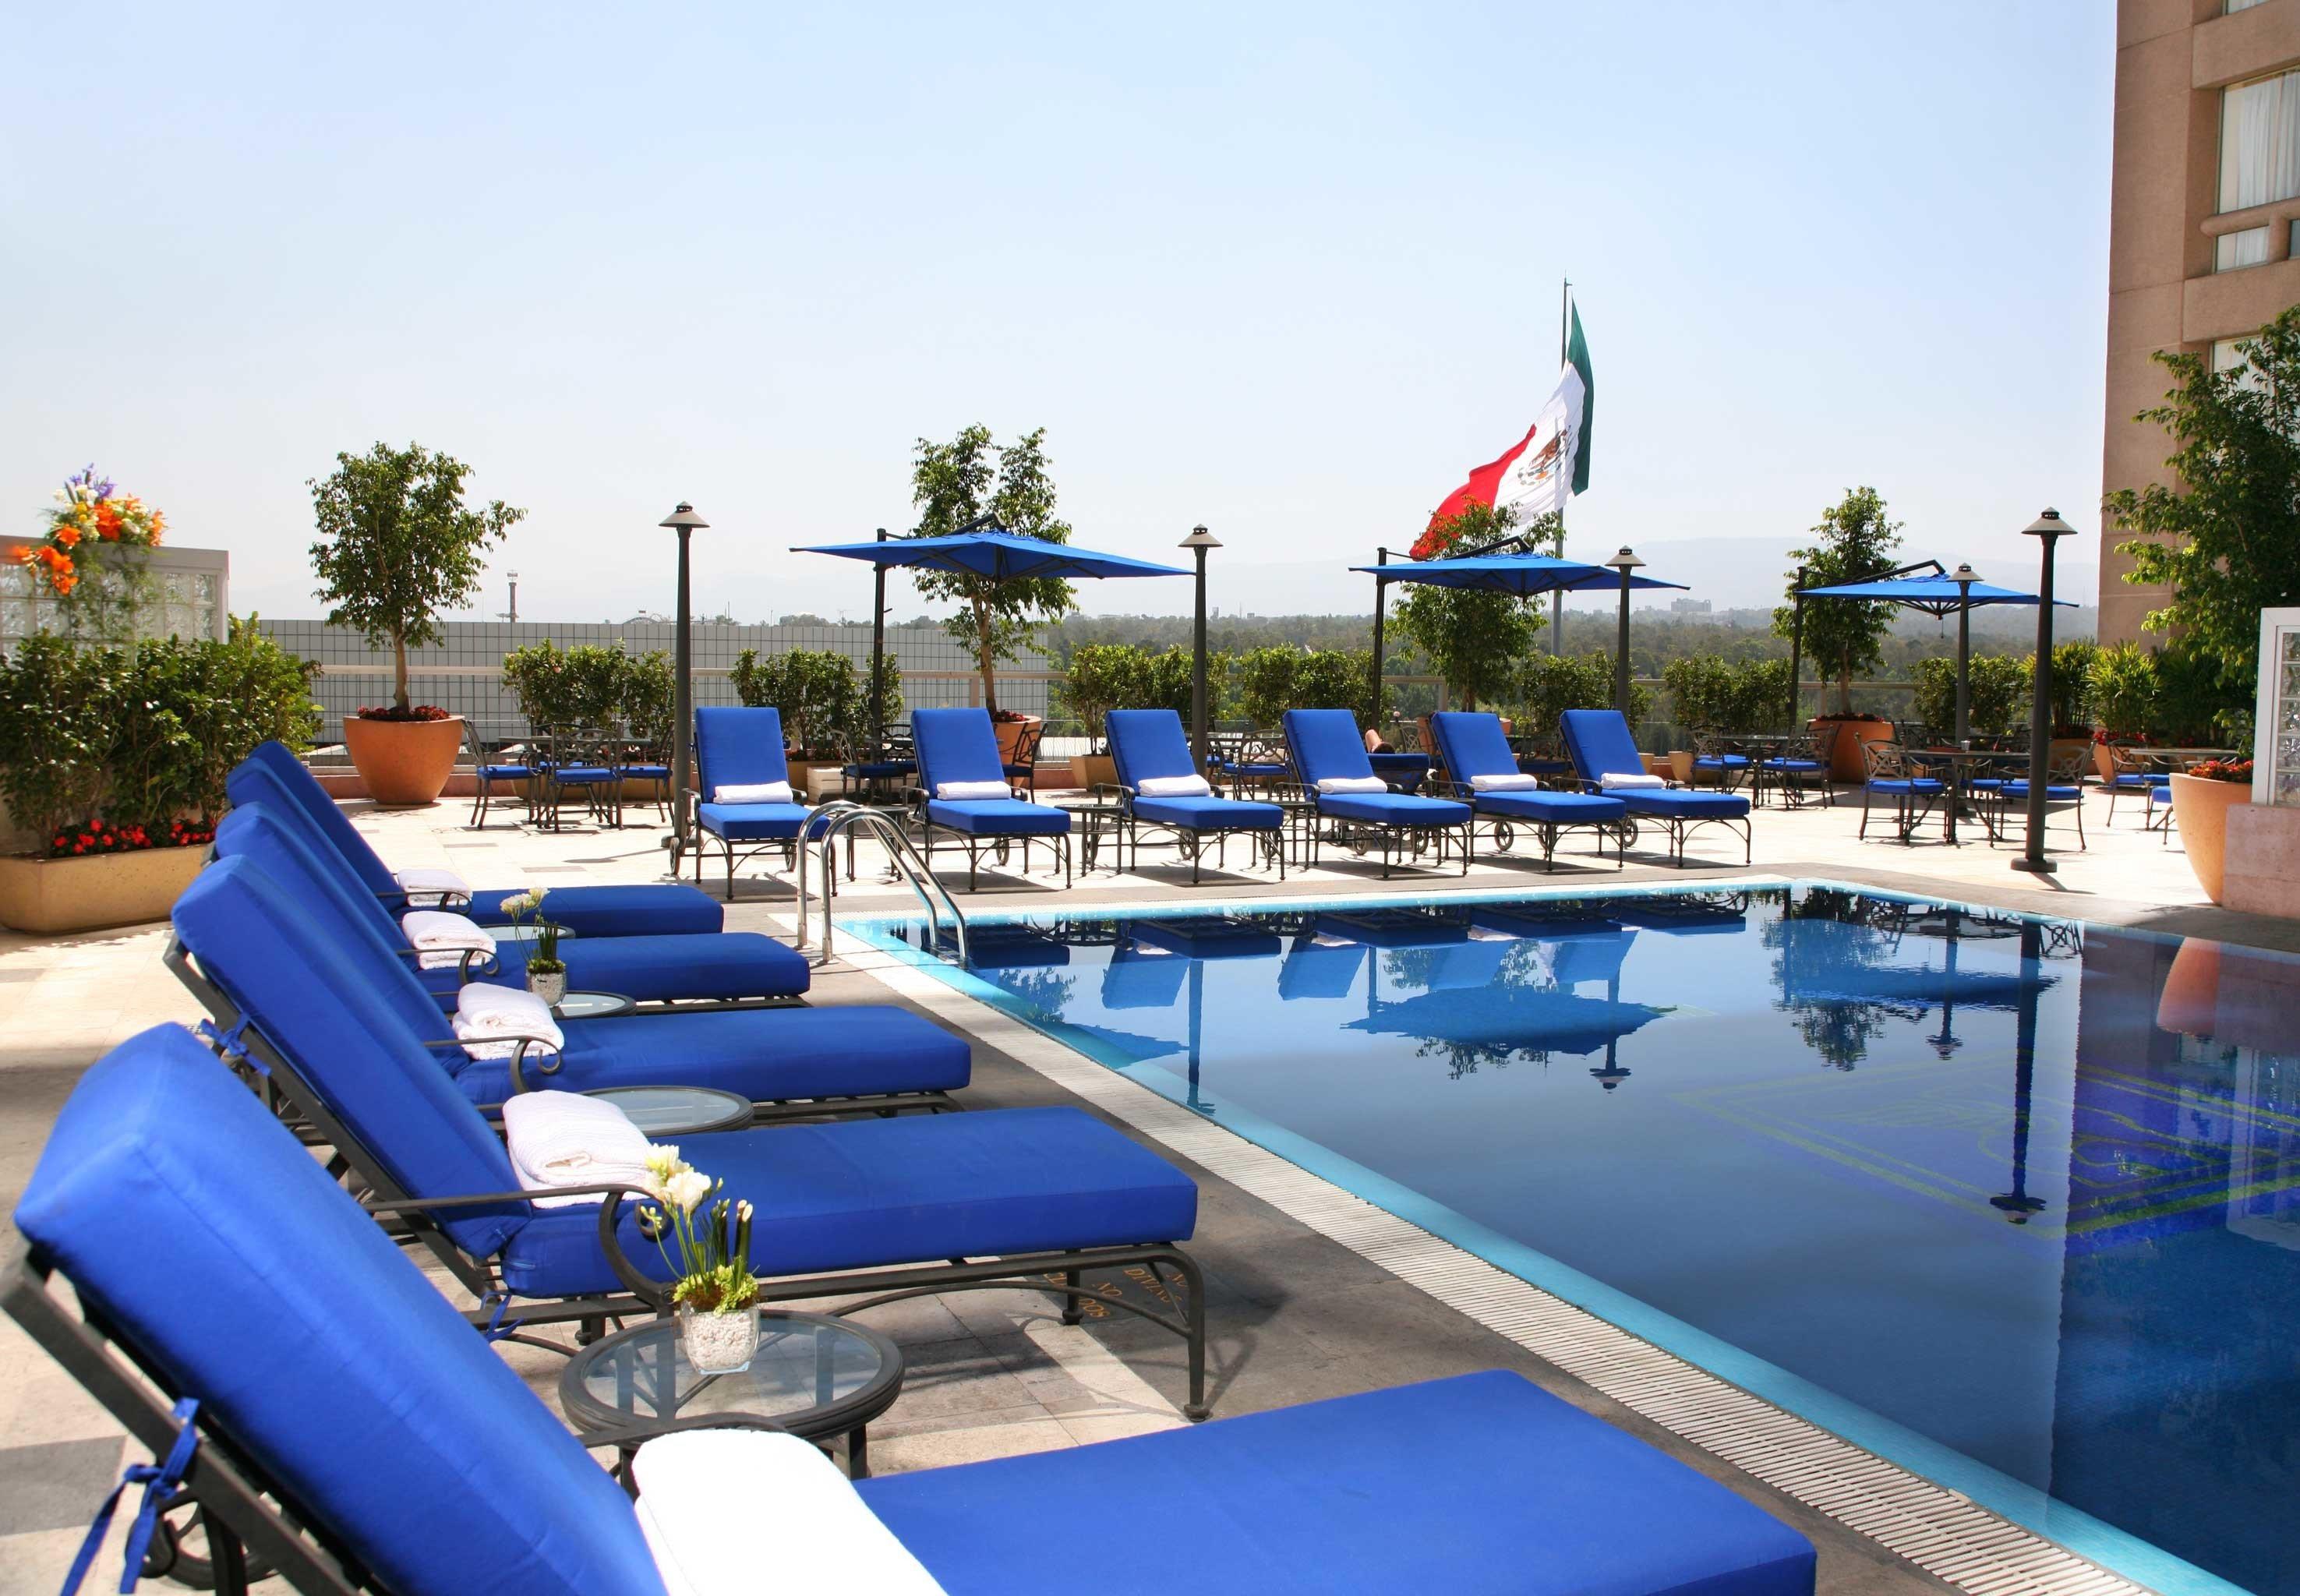 Business Elegant Lounge Patio Pool Rooftop Terrace sky leisure swimming pool Water park Resort blue marina amusement park dock inflatable